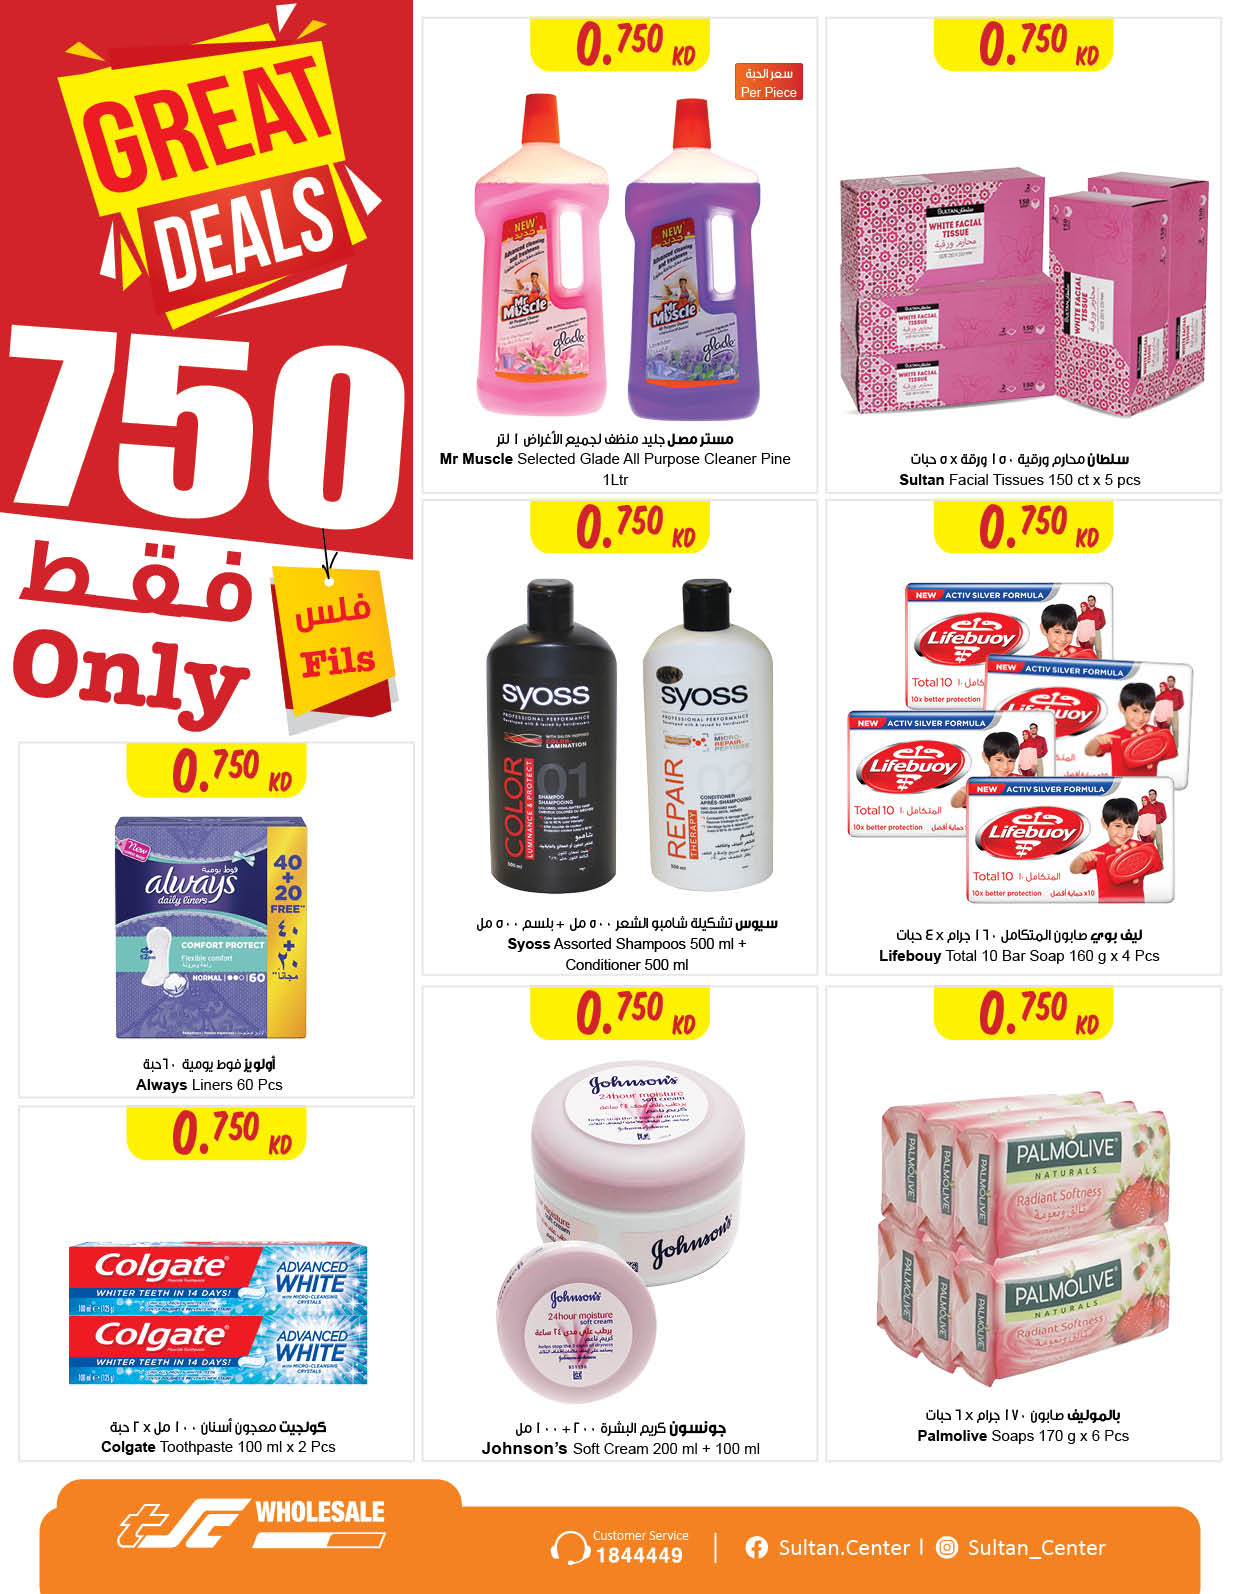 Sultan Center Weekly promotions, iiQ8, Deals in Sultan Centre Kuwait Jan 2021 7